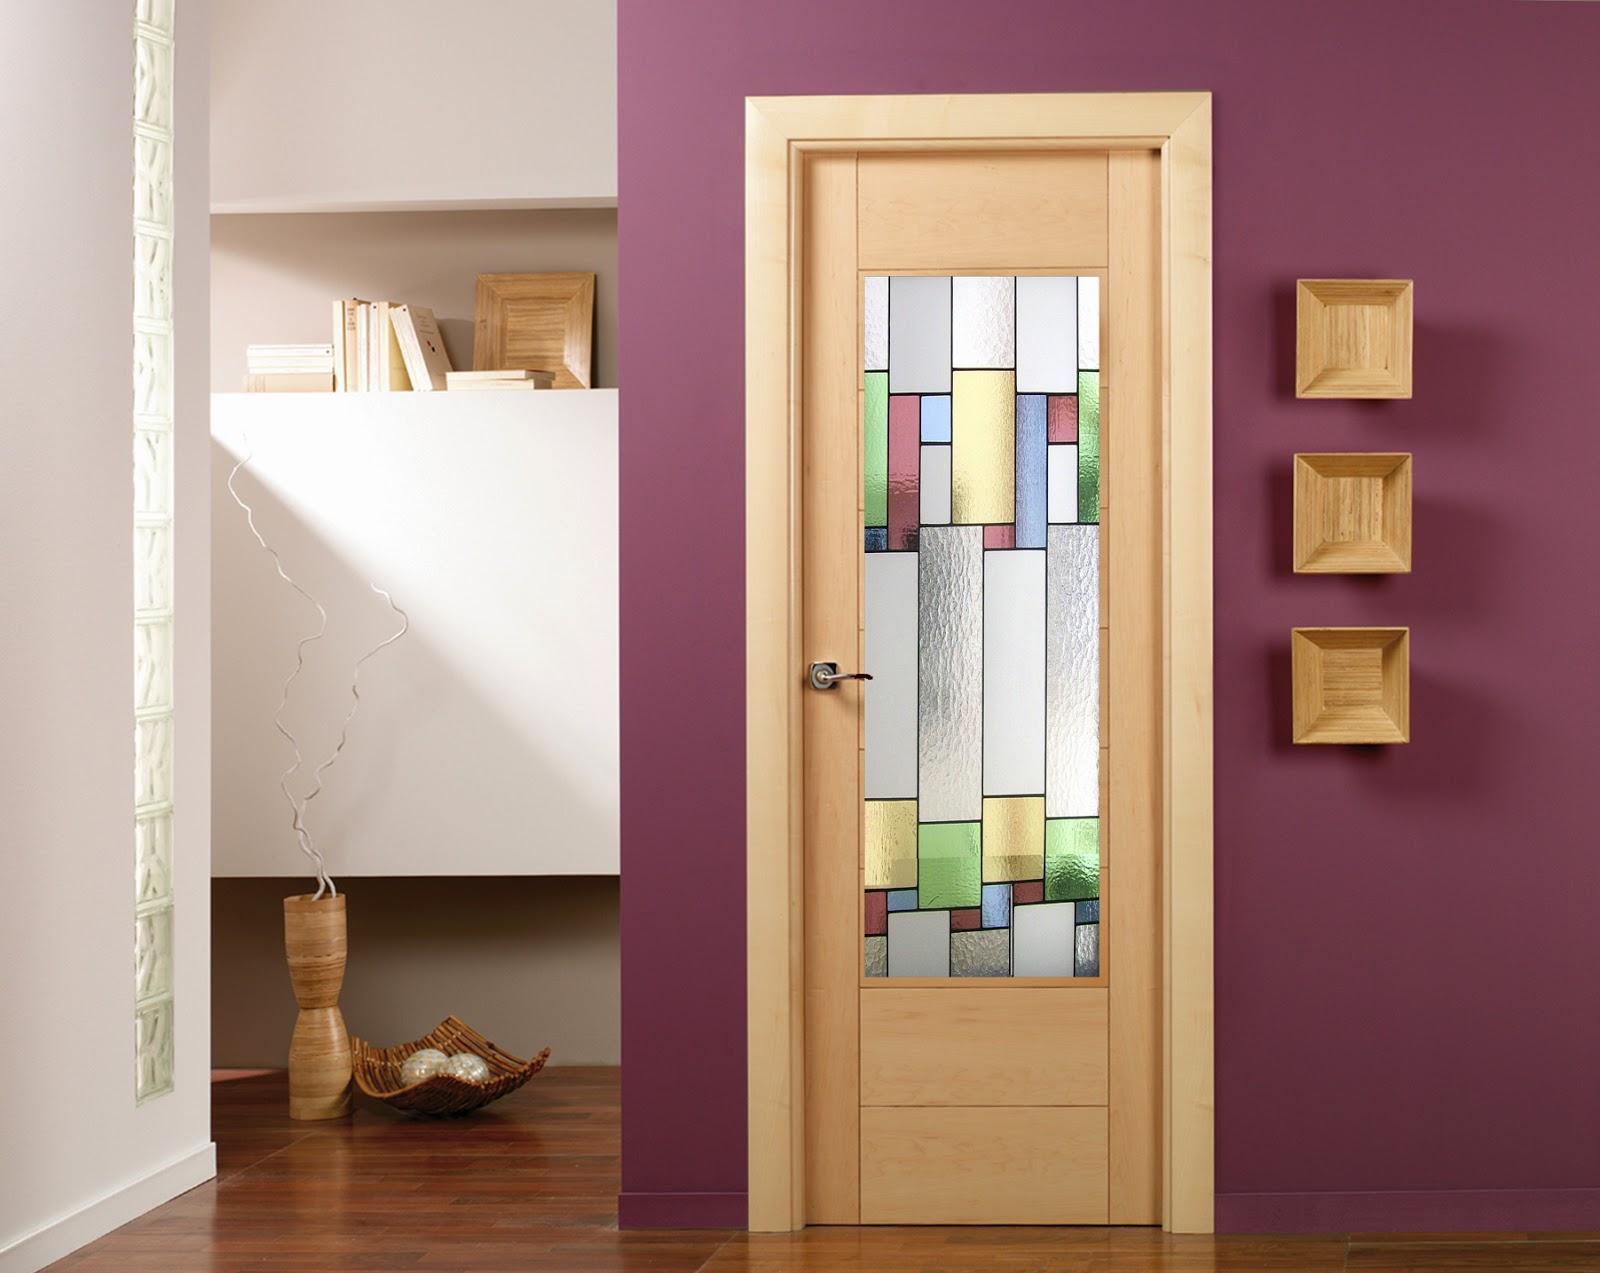 Vidrieras artesanas puertas de interior - Vidrieras para puertas ...